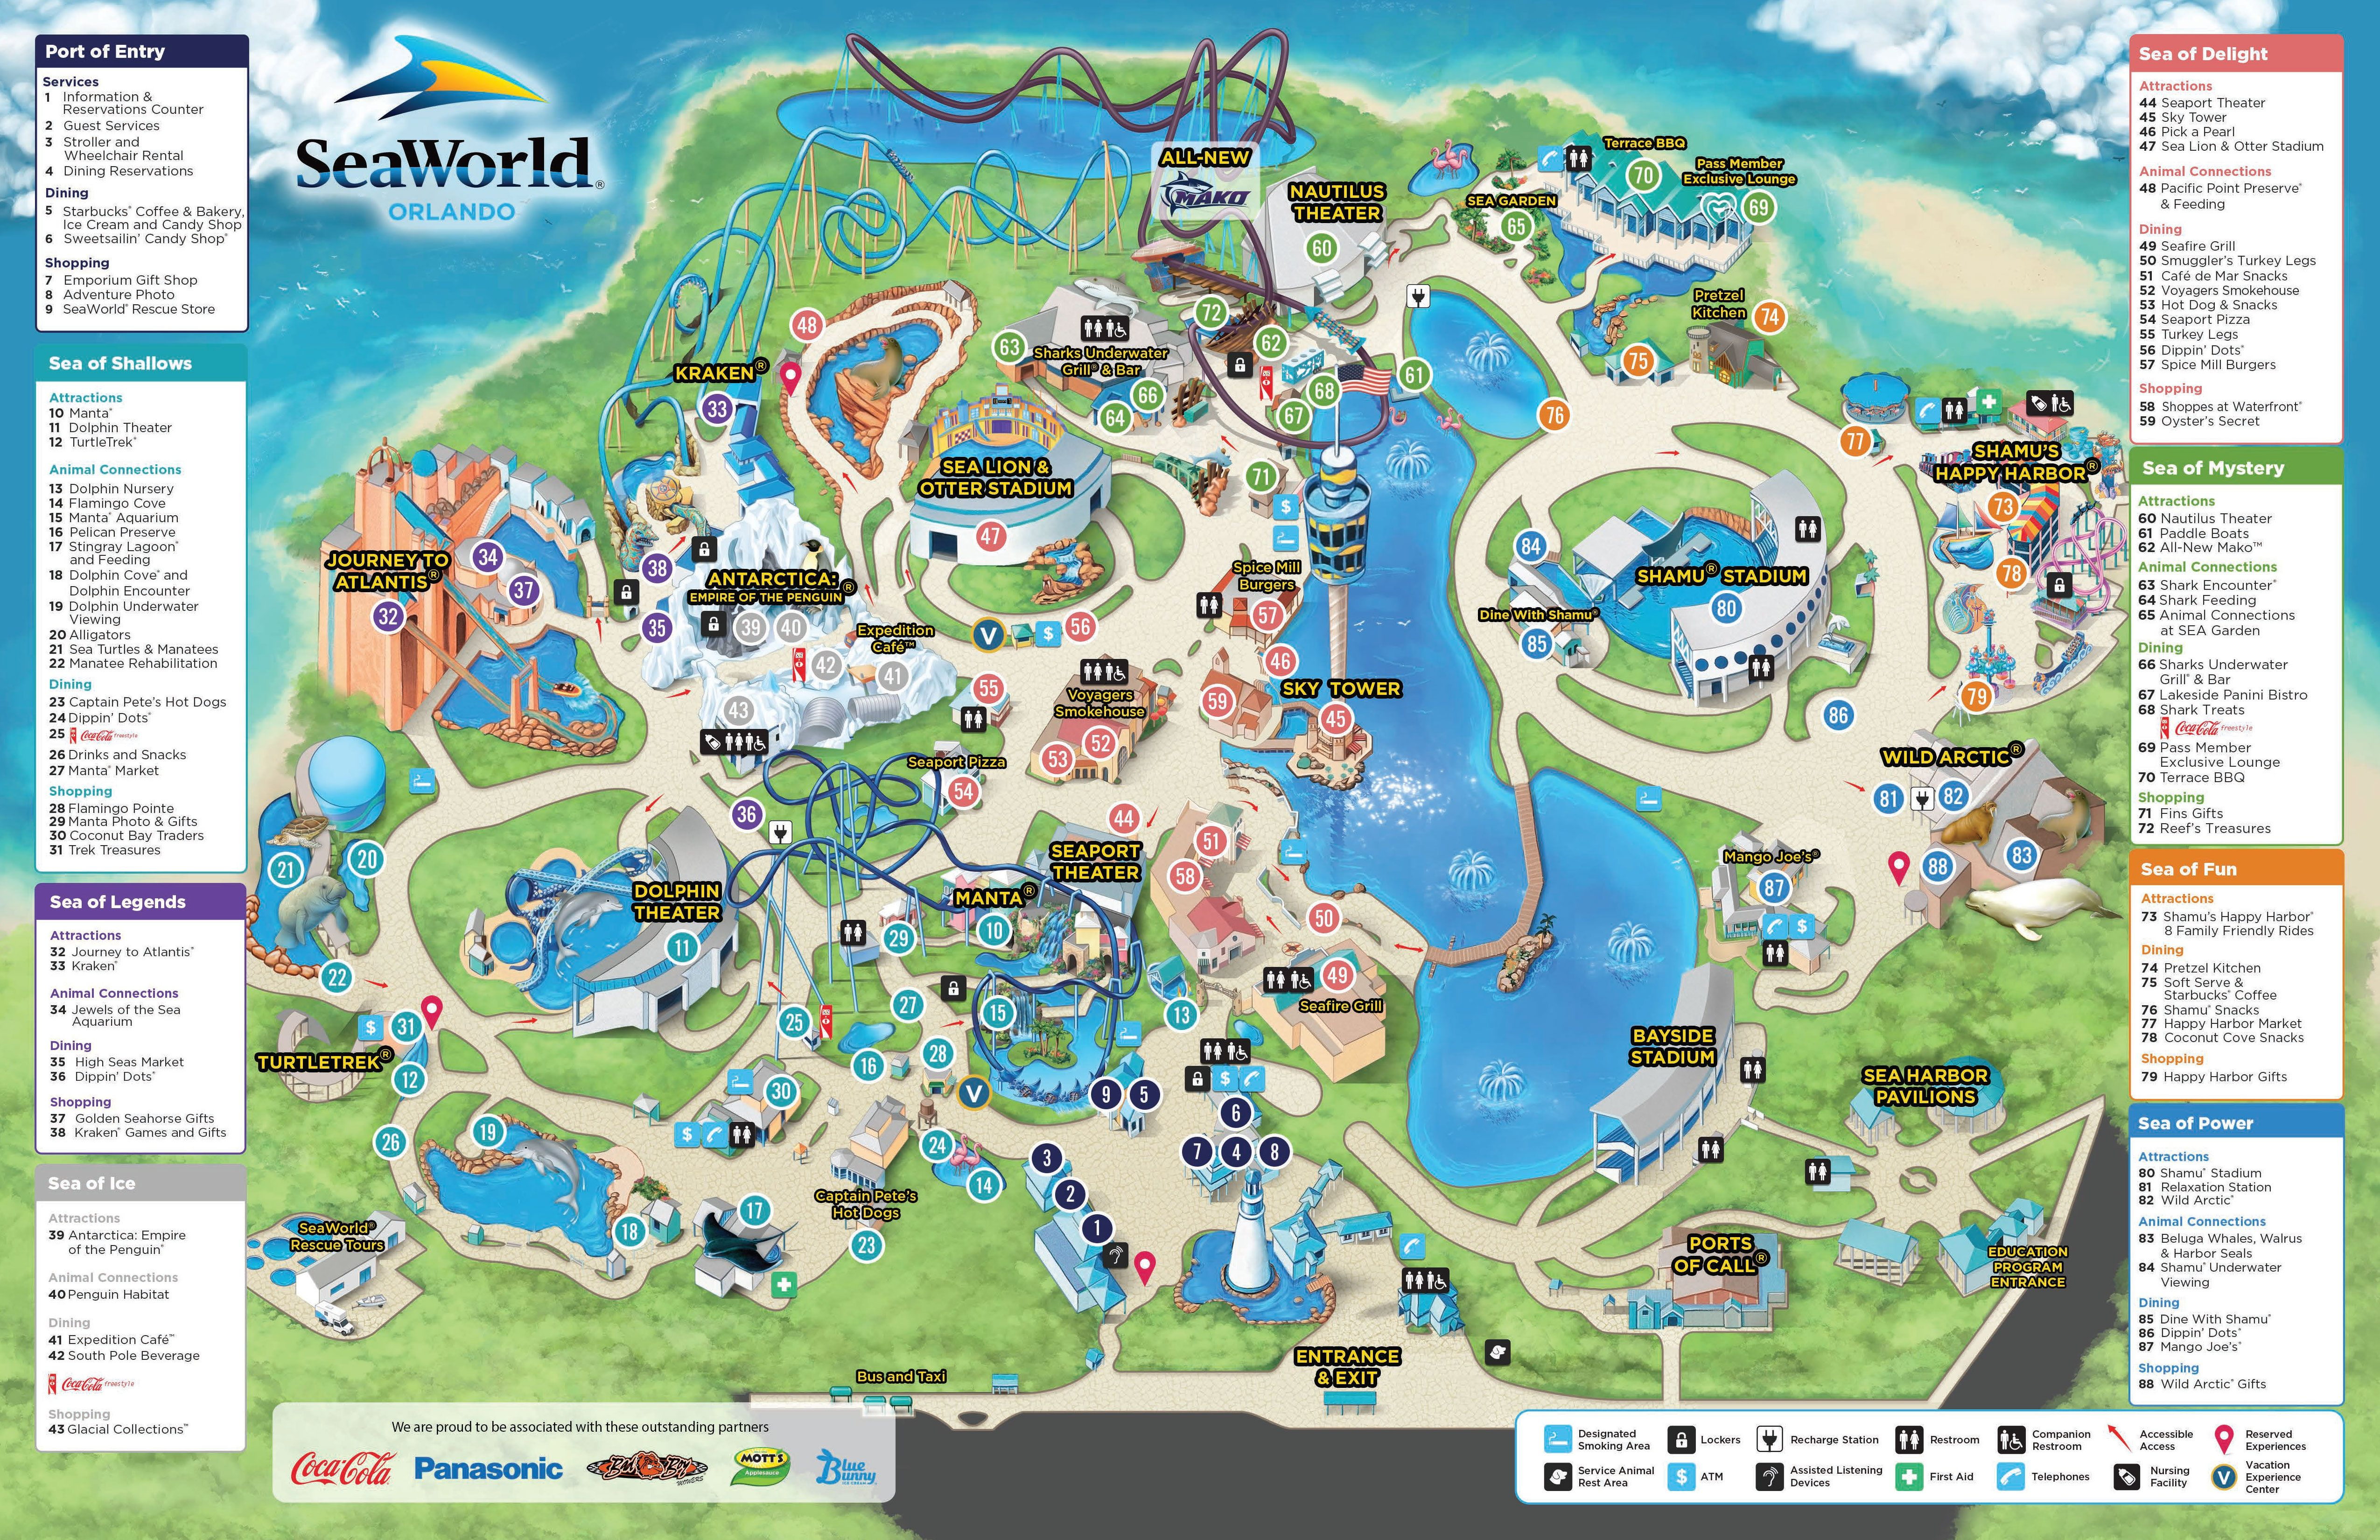 09_14_15_Park_Map | Favorite Places & Spaces | Pinterest | Orlando - Seaworld Map Orlando Florida